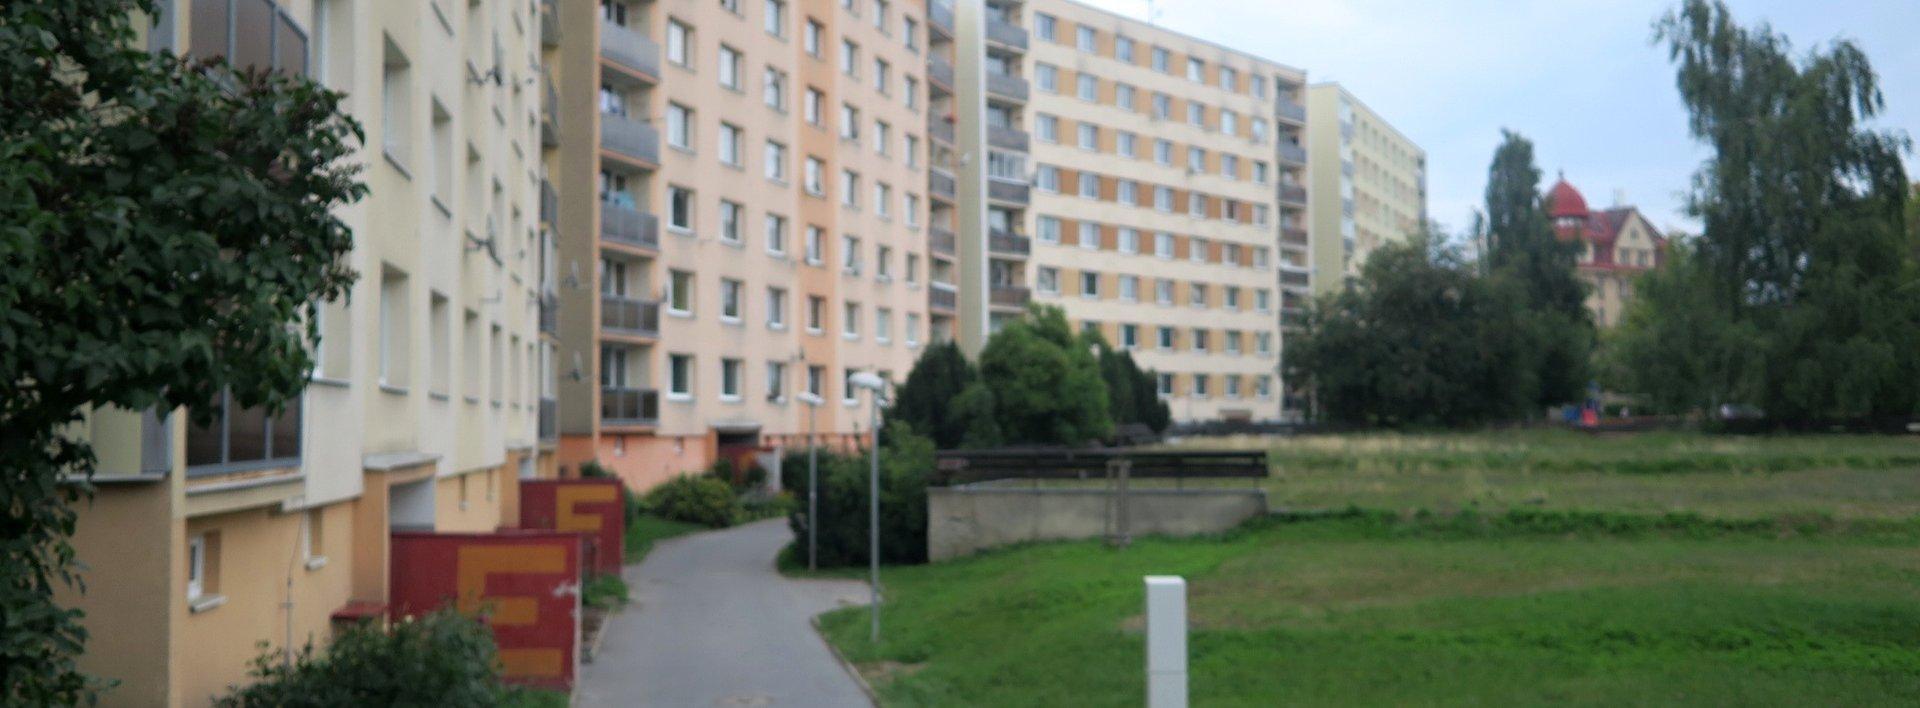 Byt 2+1 v OV, v Liberecké ul., Ev.č.: N48532